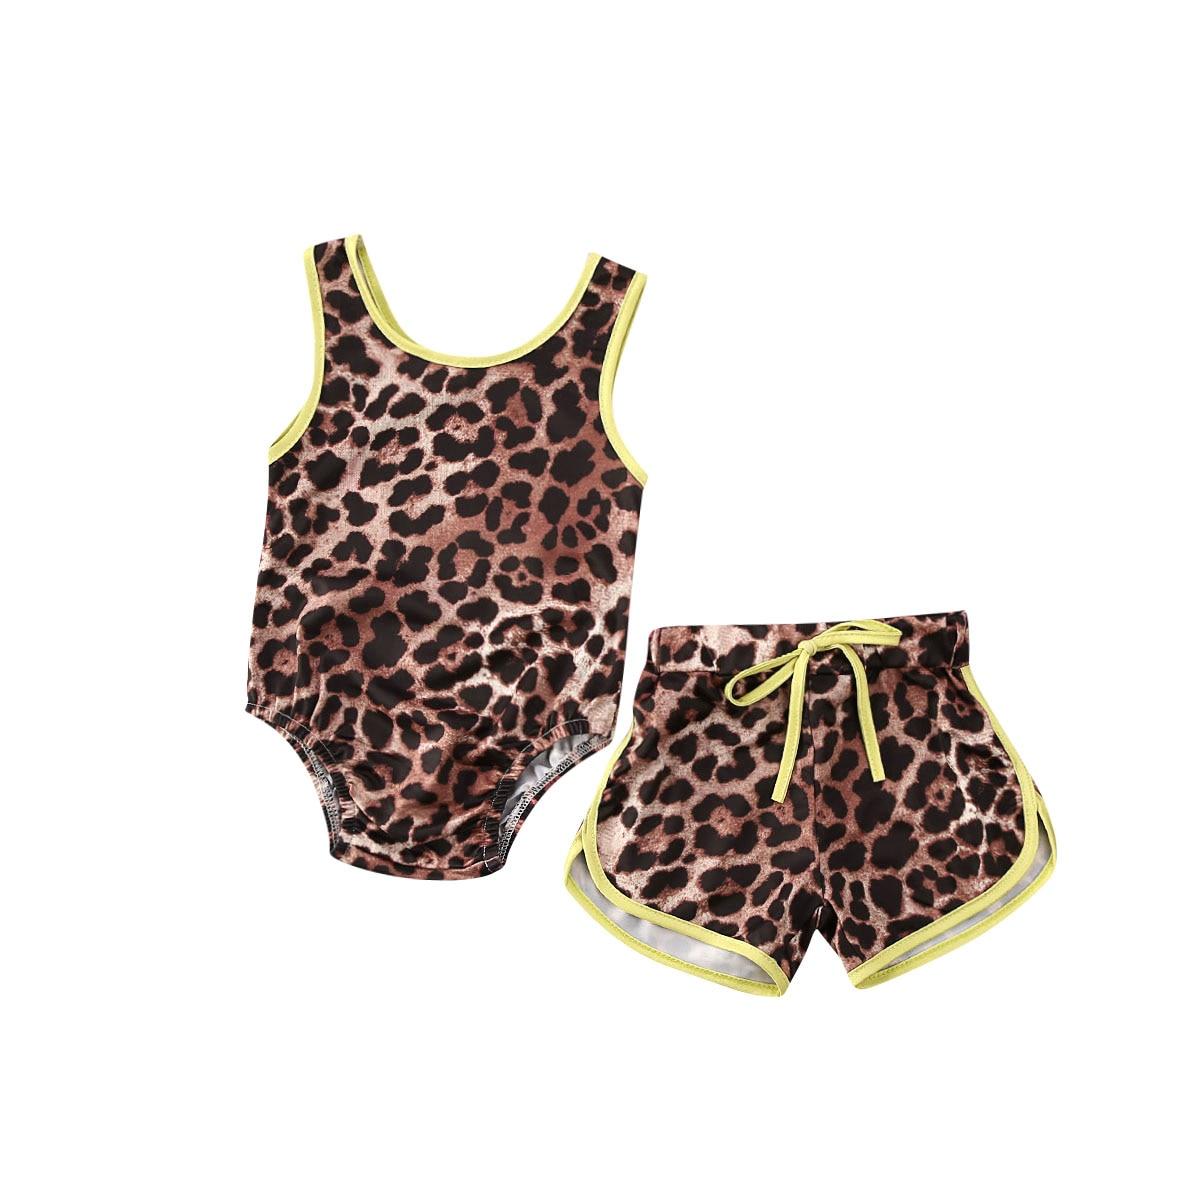 Summer Toddler Kids Baby Girls Leopard Swimwear Sleeveless Romper Top Shorts Swimsuit Fluorescent Green Bikini Set Bathing Suit